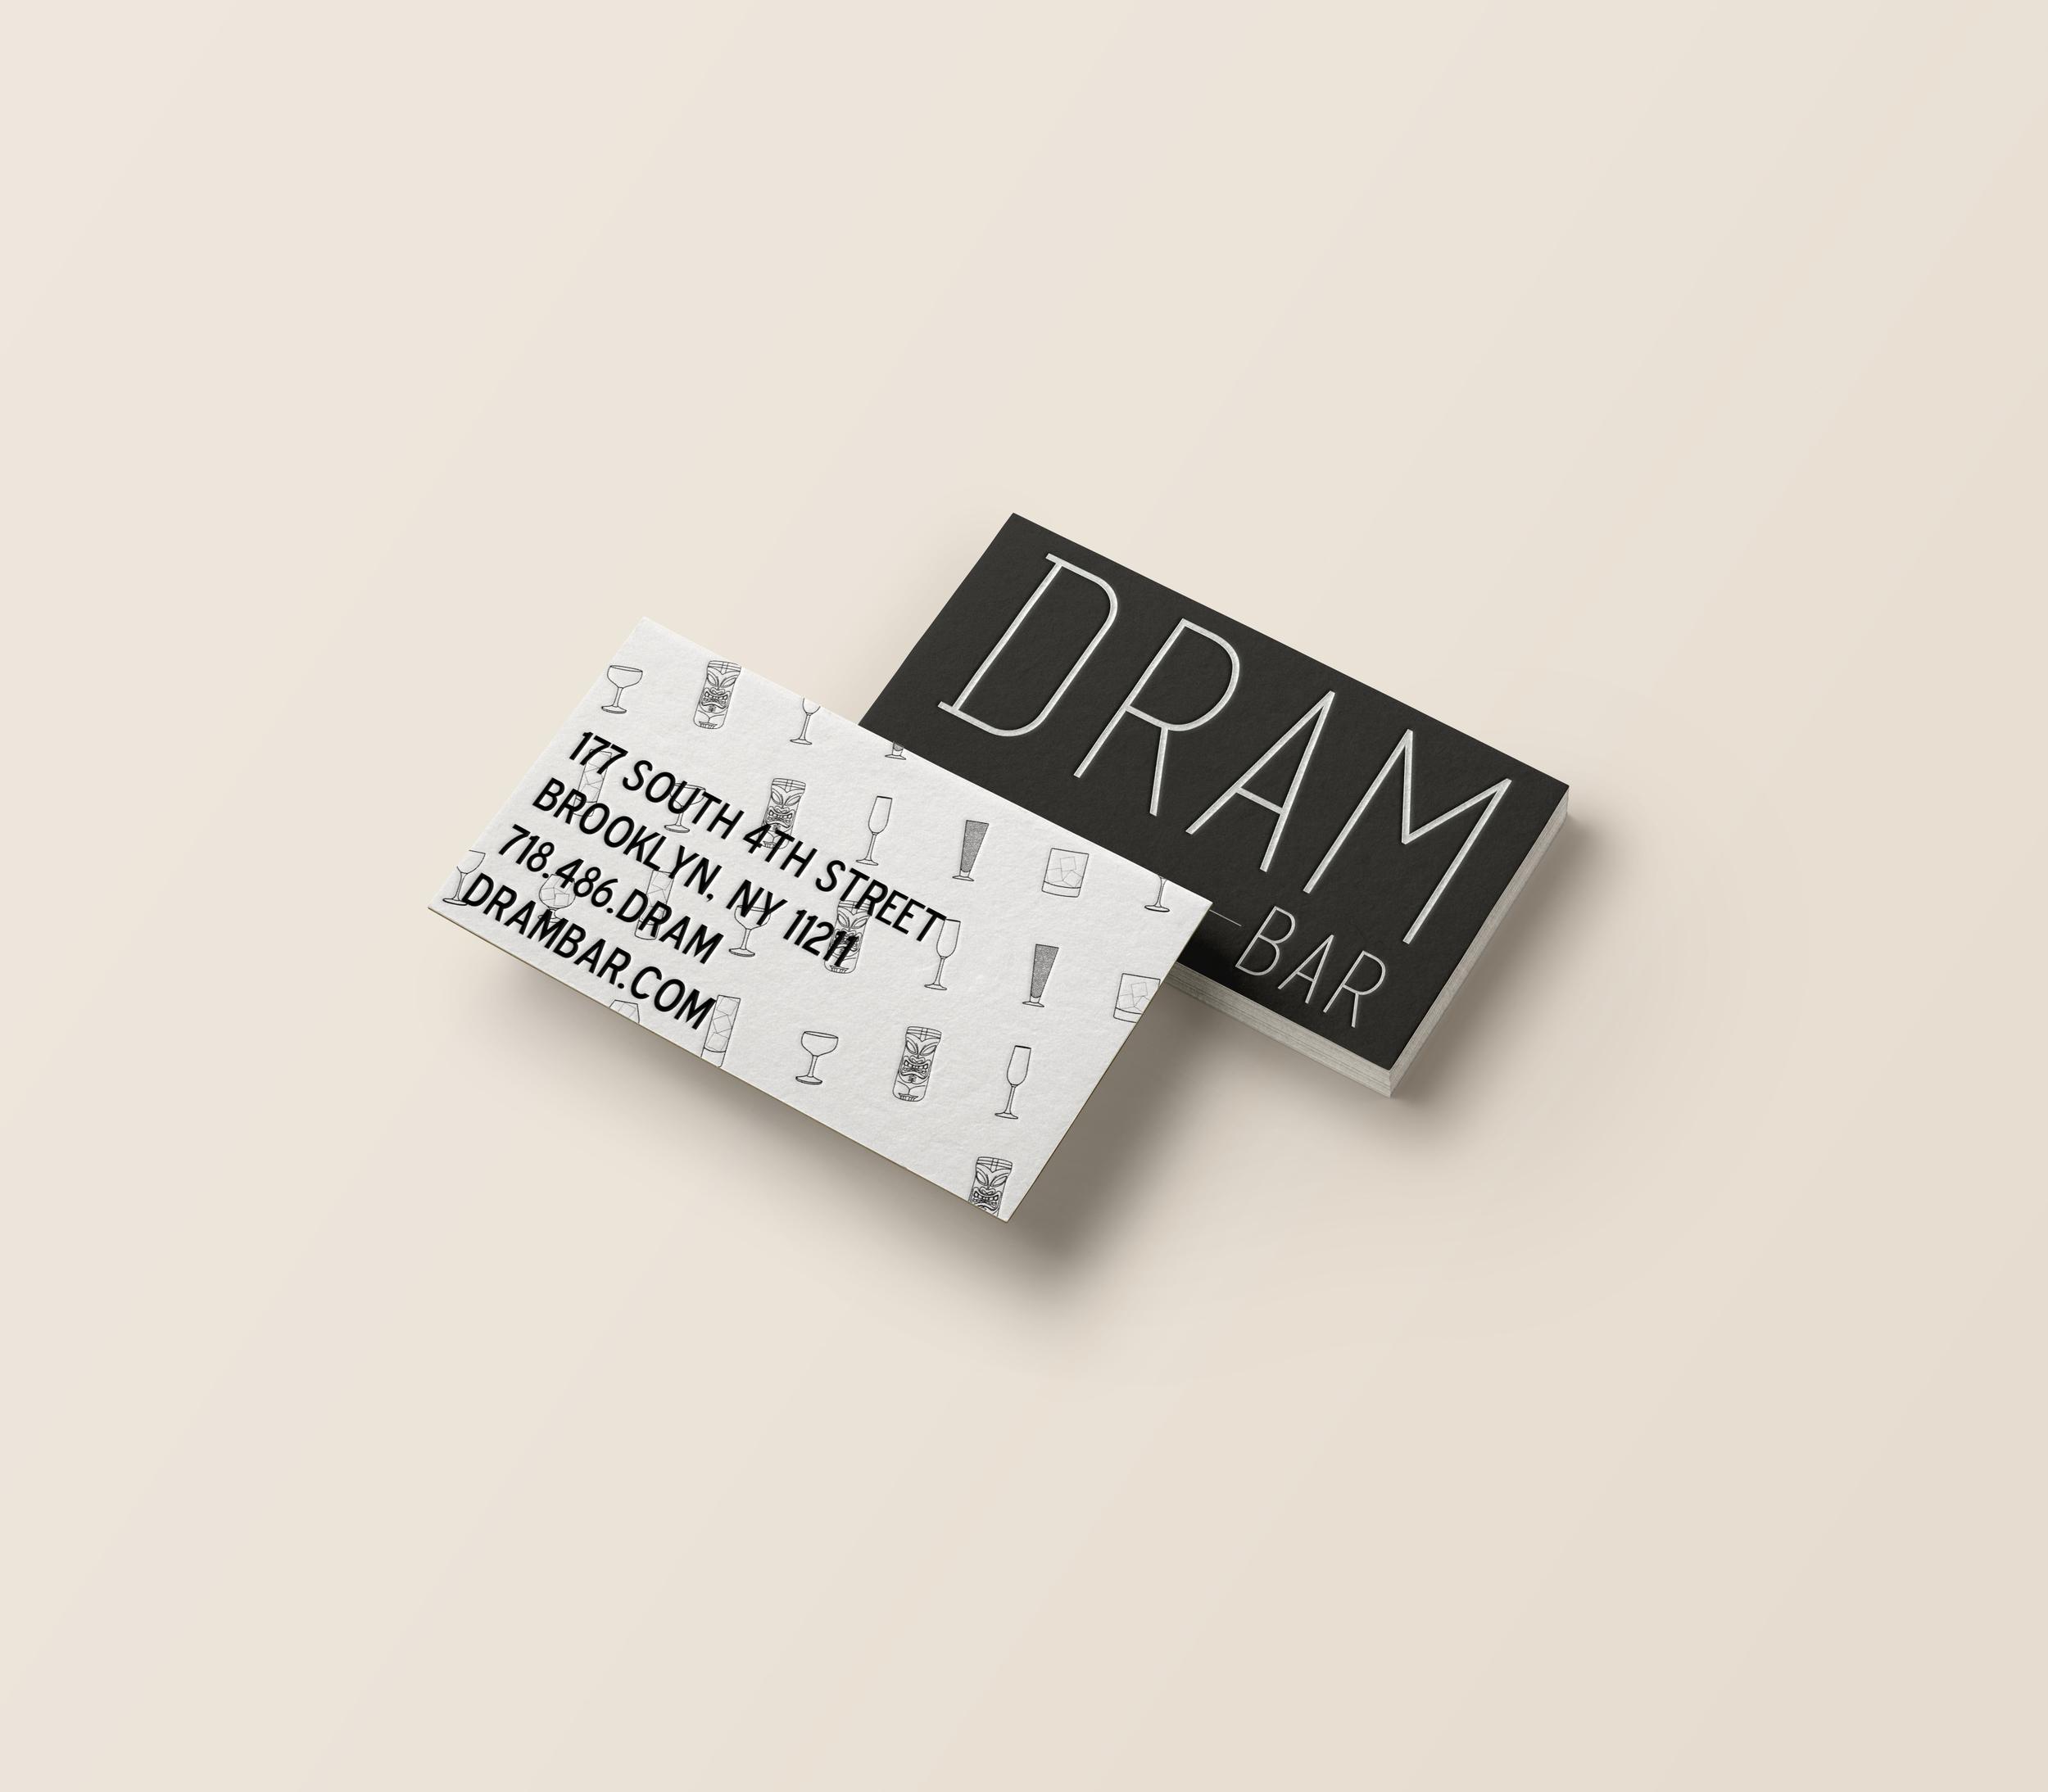 Dram Business Card